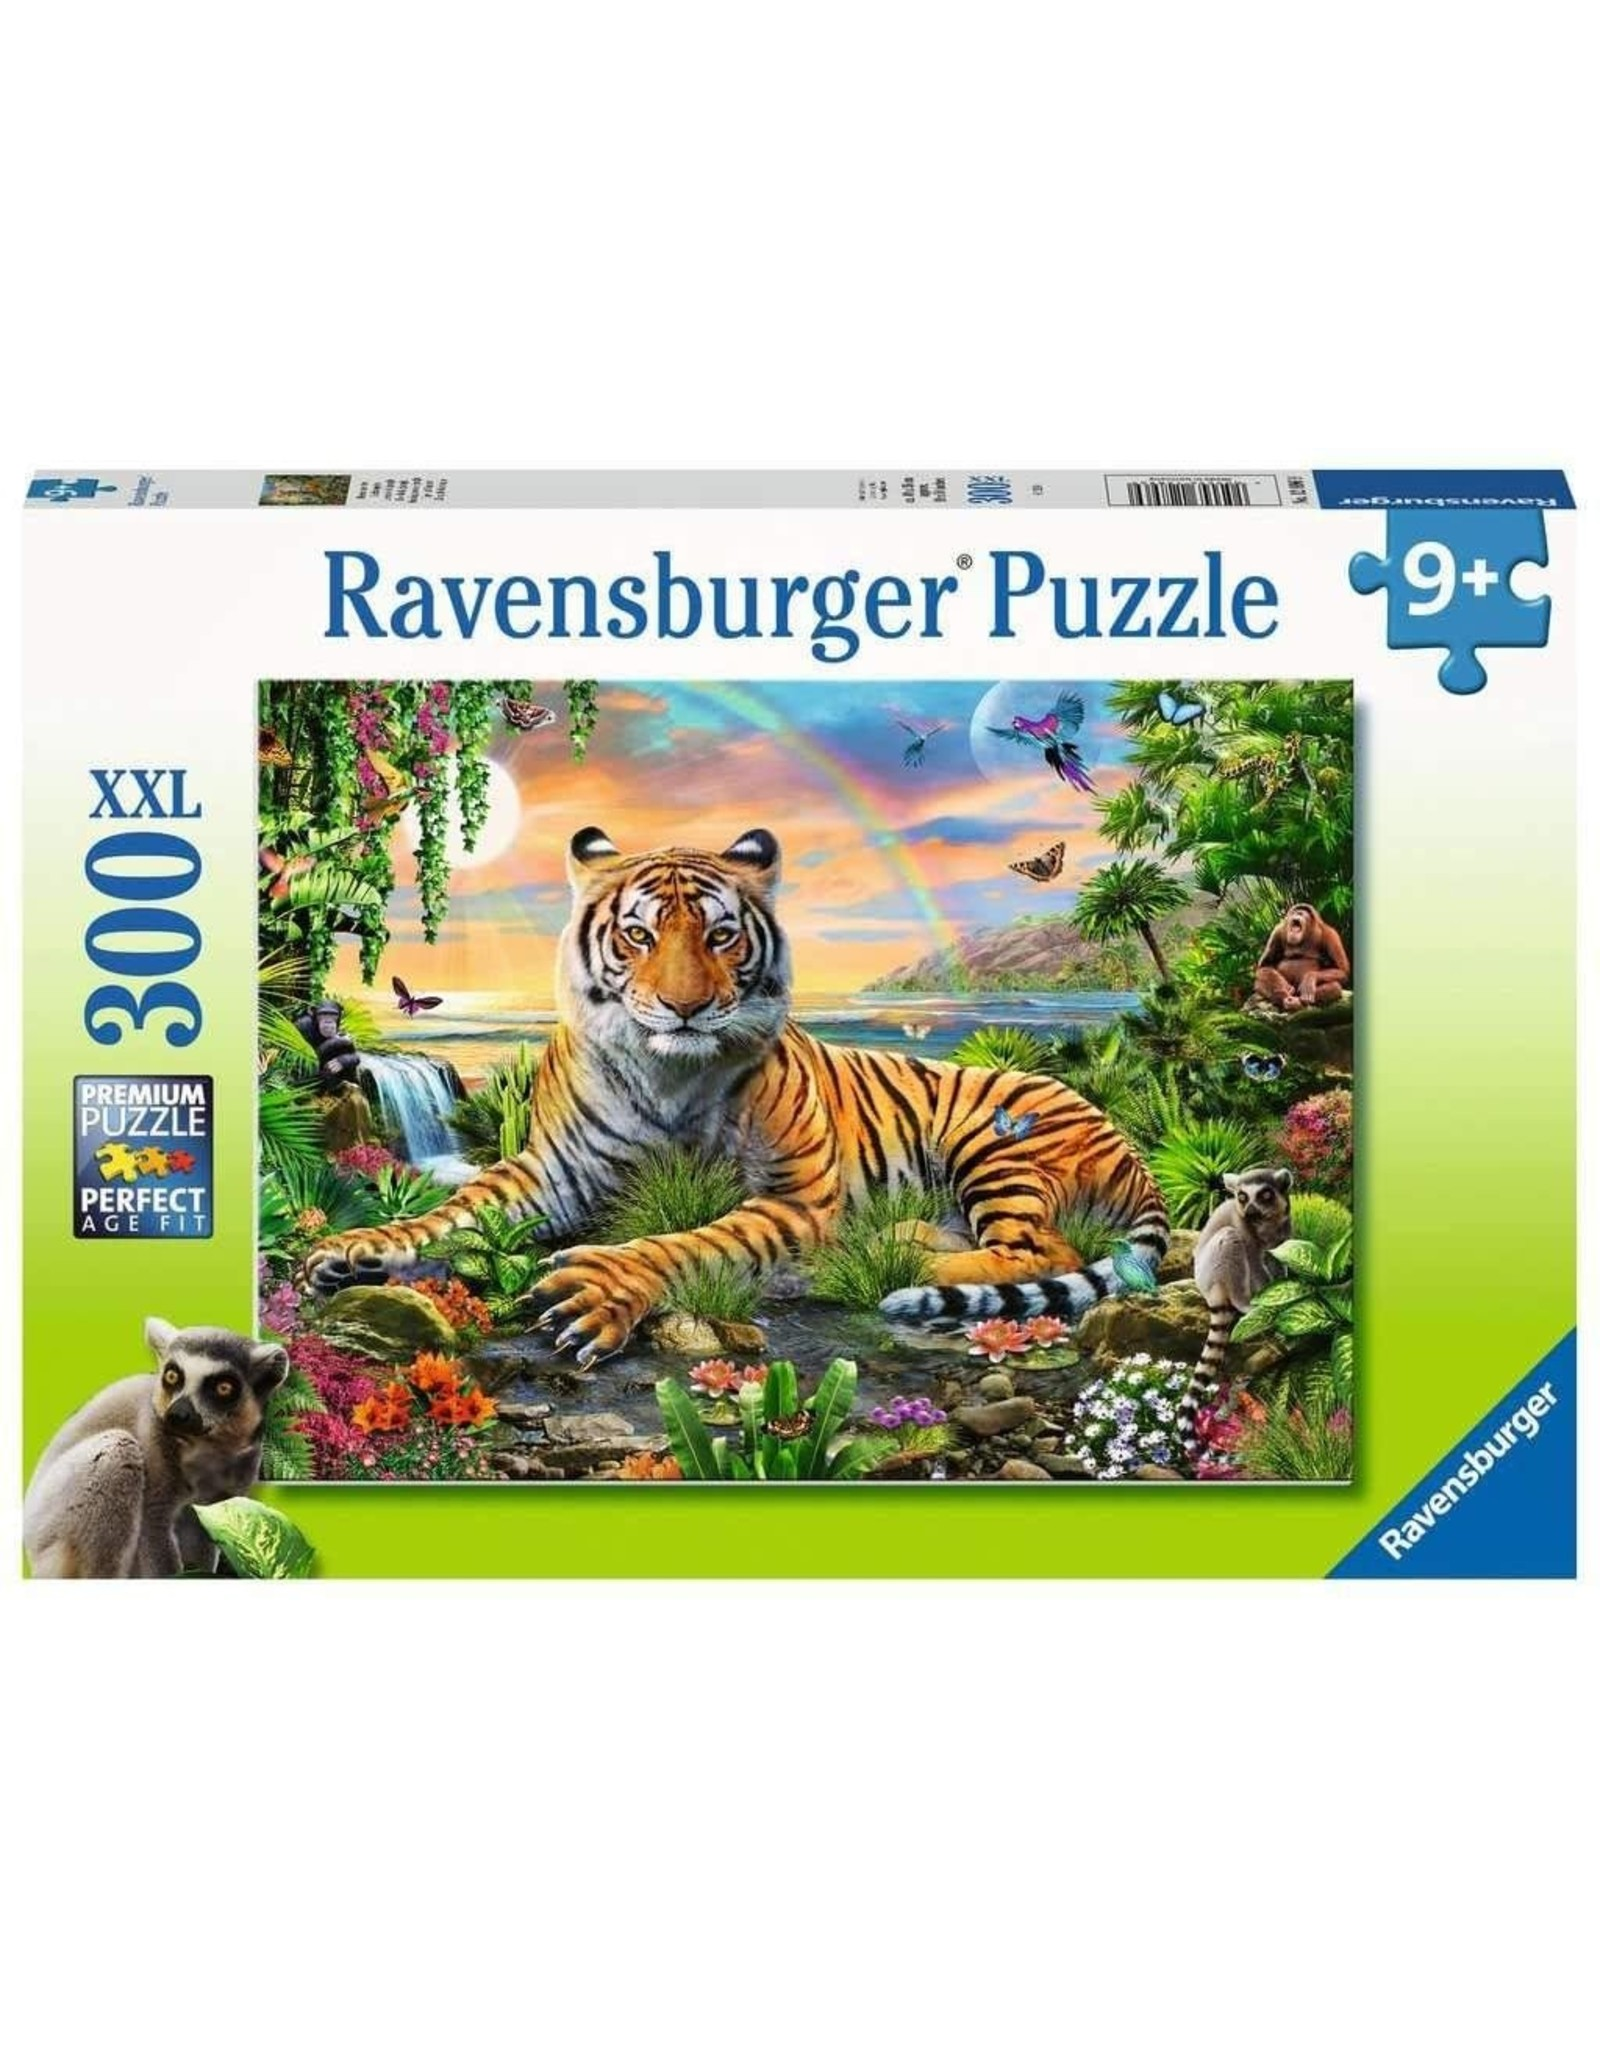 Ravensburger Le roi de la jungle 300mcx XXL